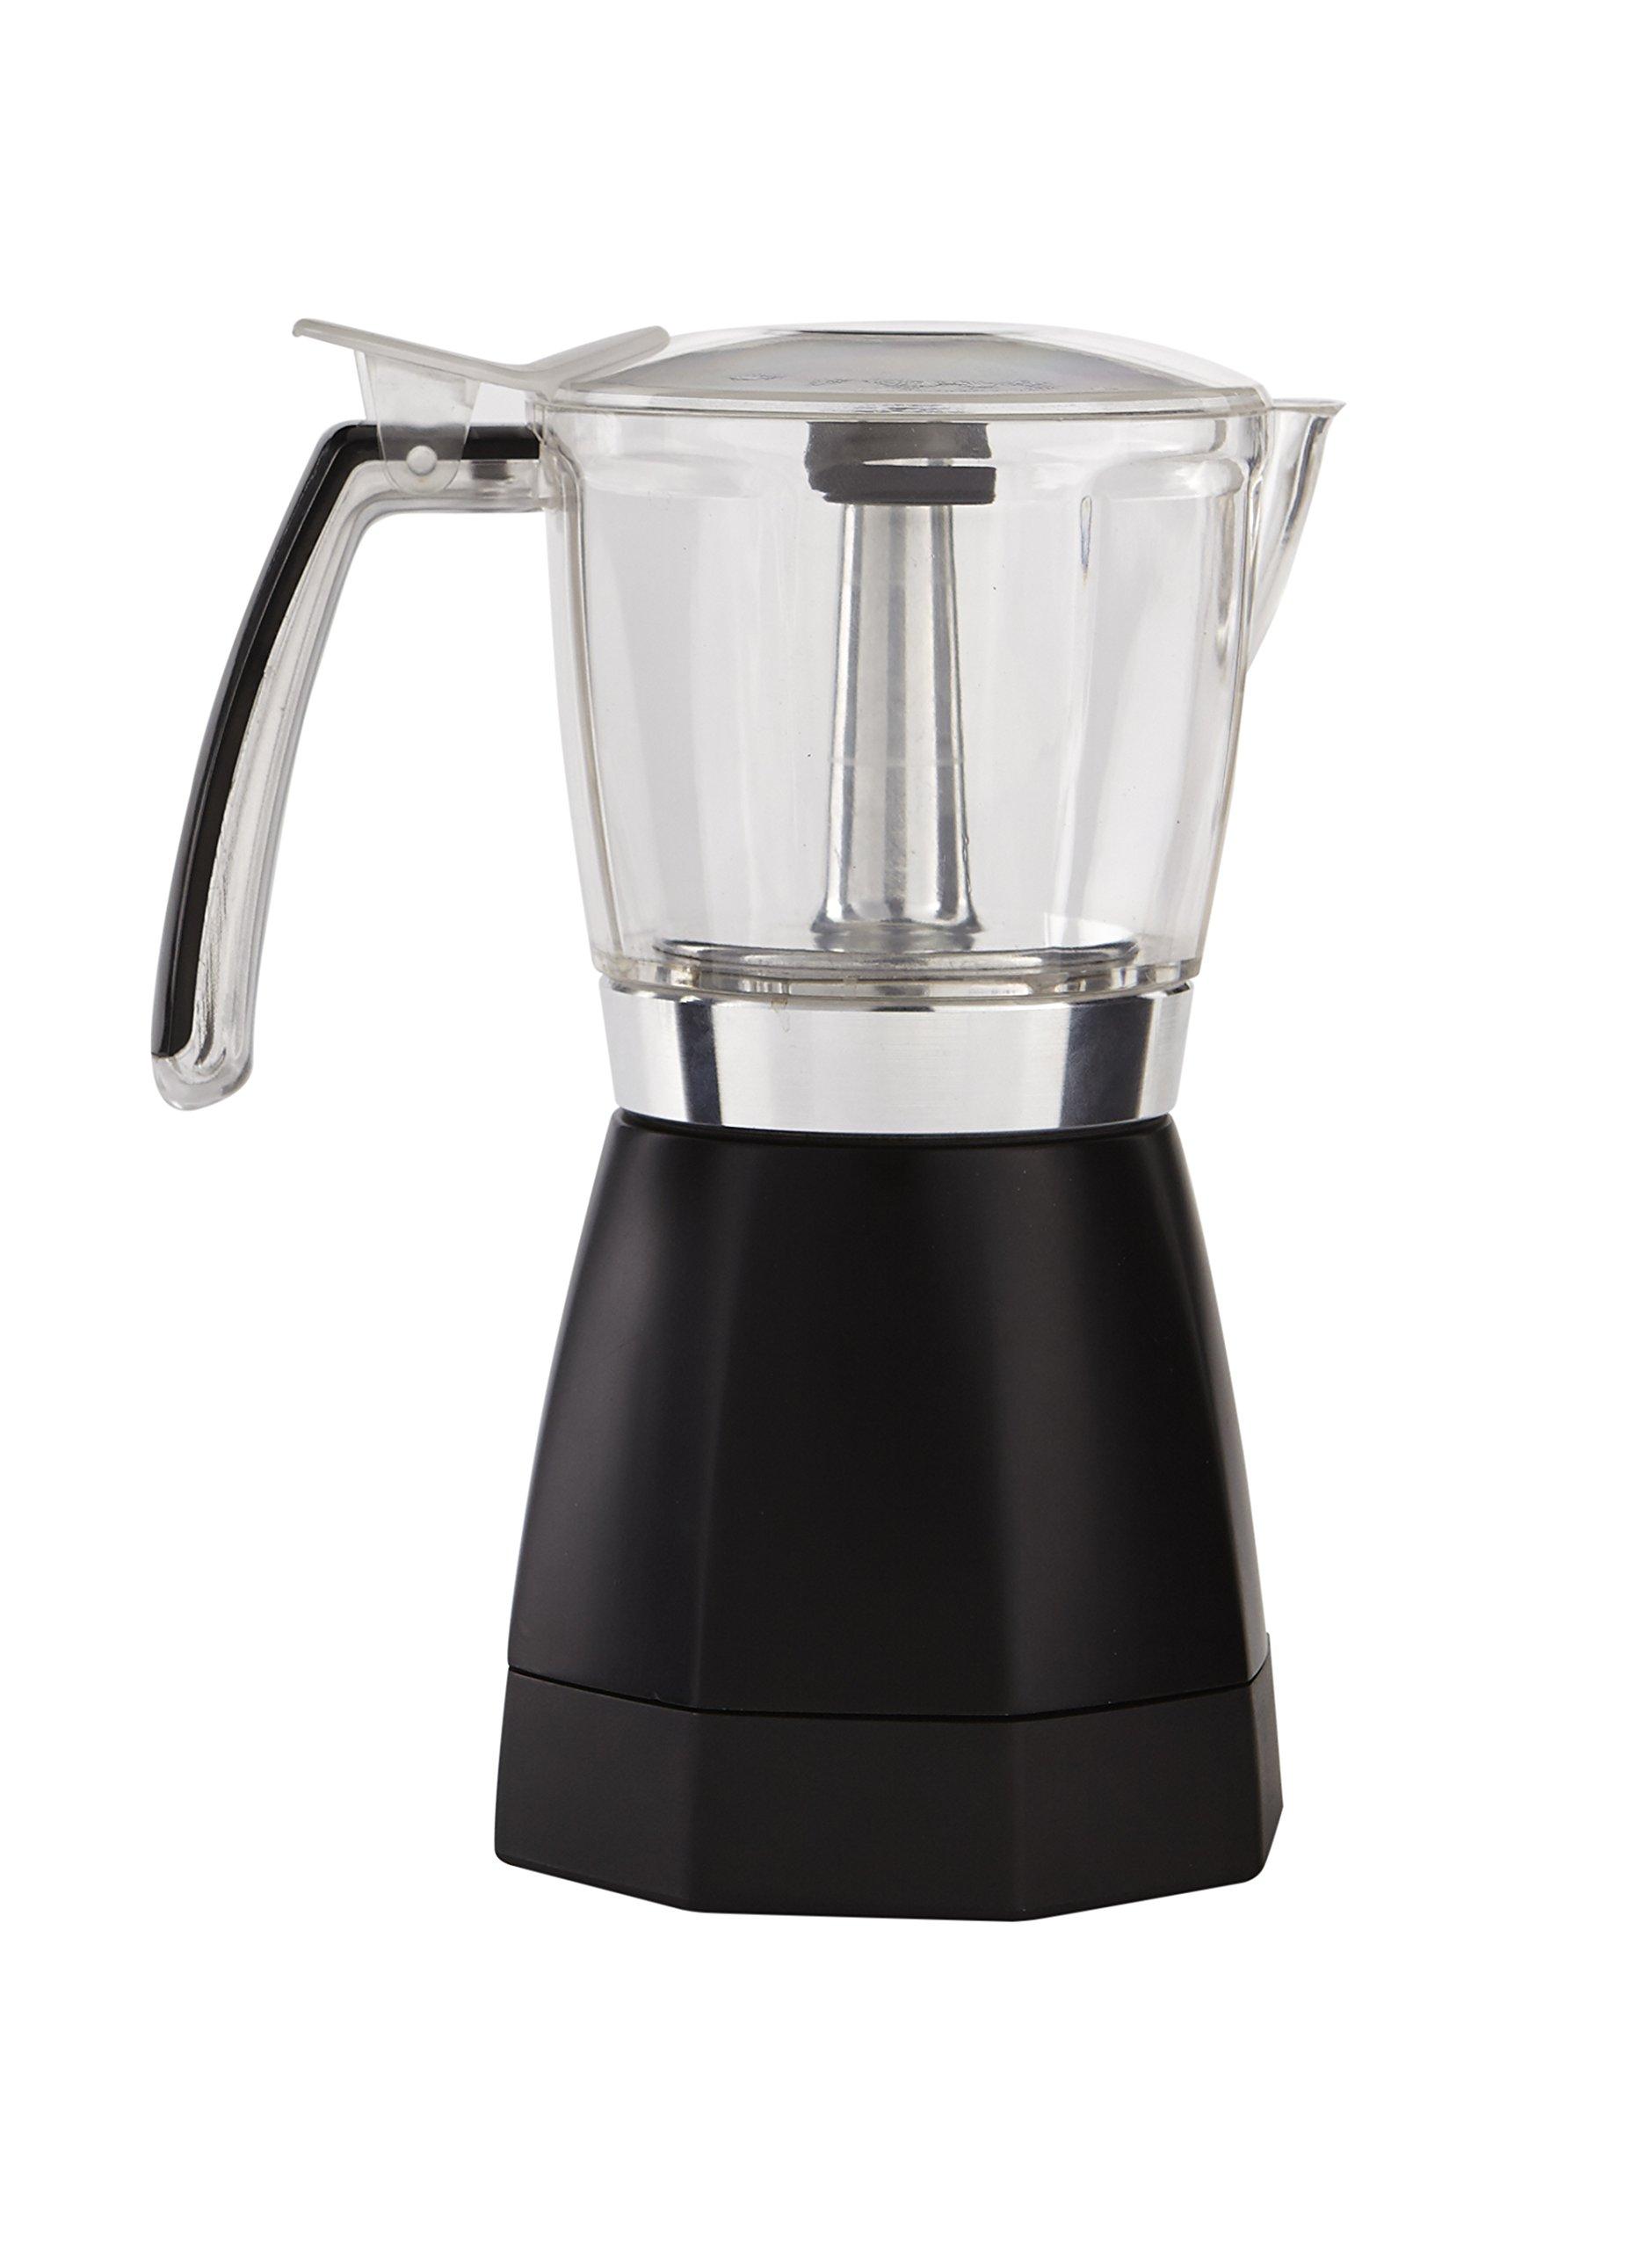 IMUSA USA B120-60006 Electric Coffee/Moka Maker 3-6-Cup, Black - Top 10 Appliances